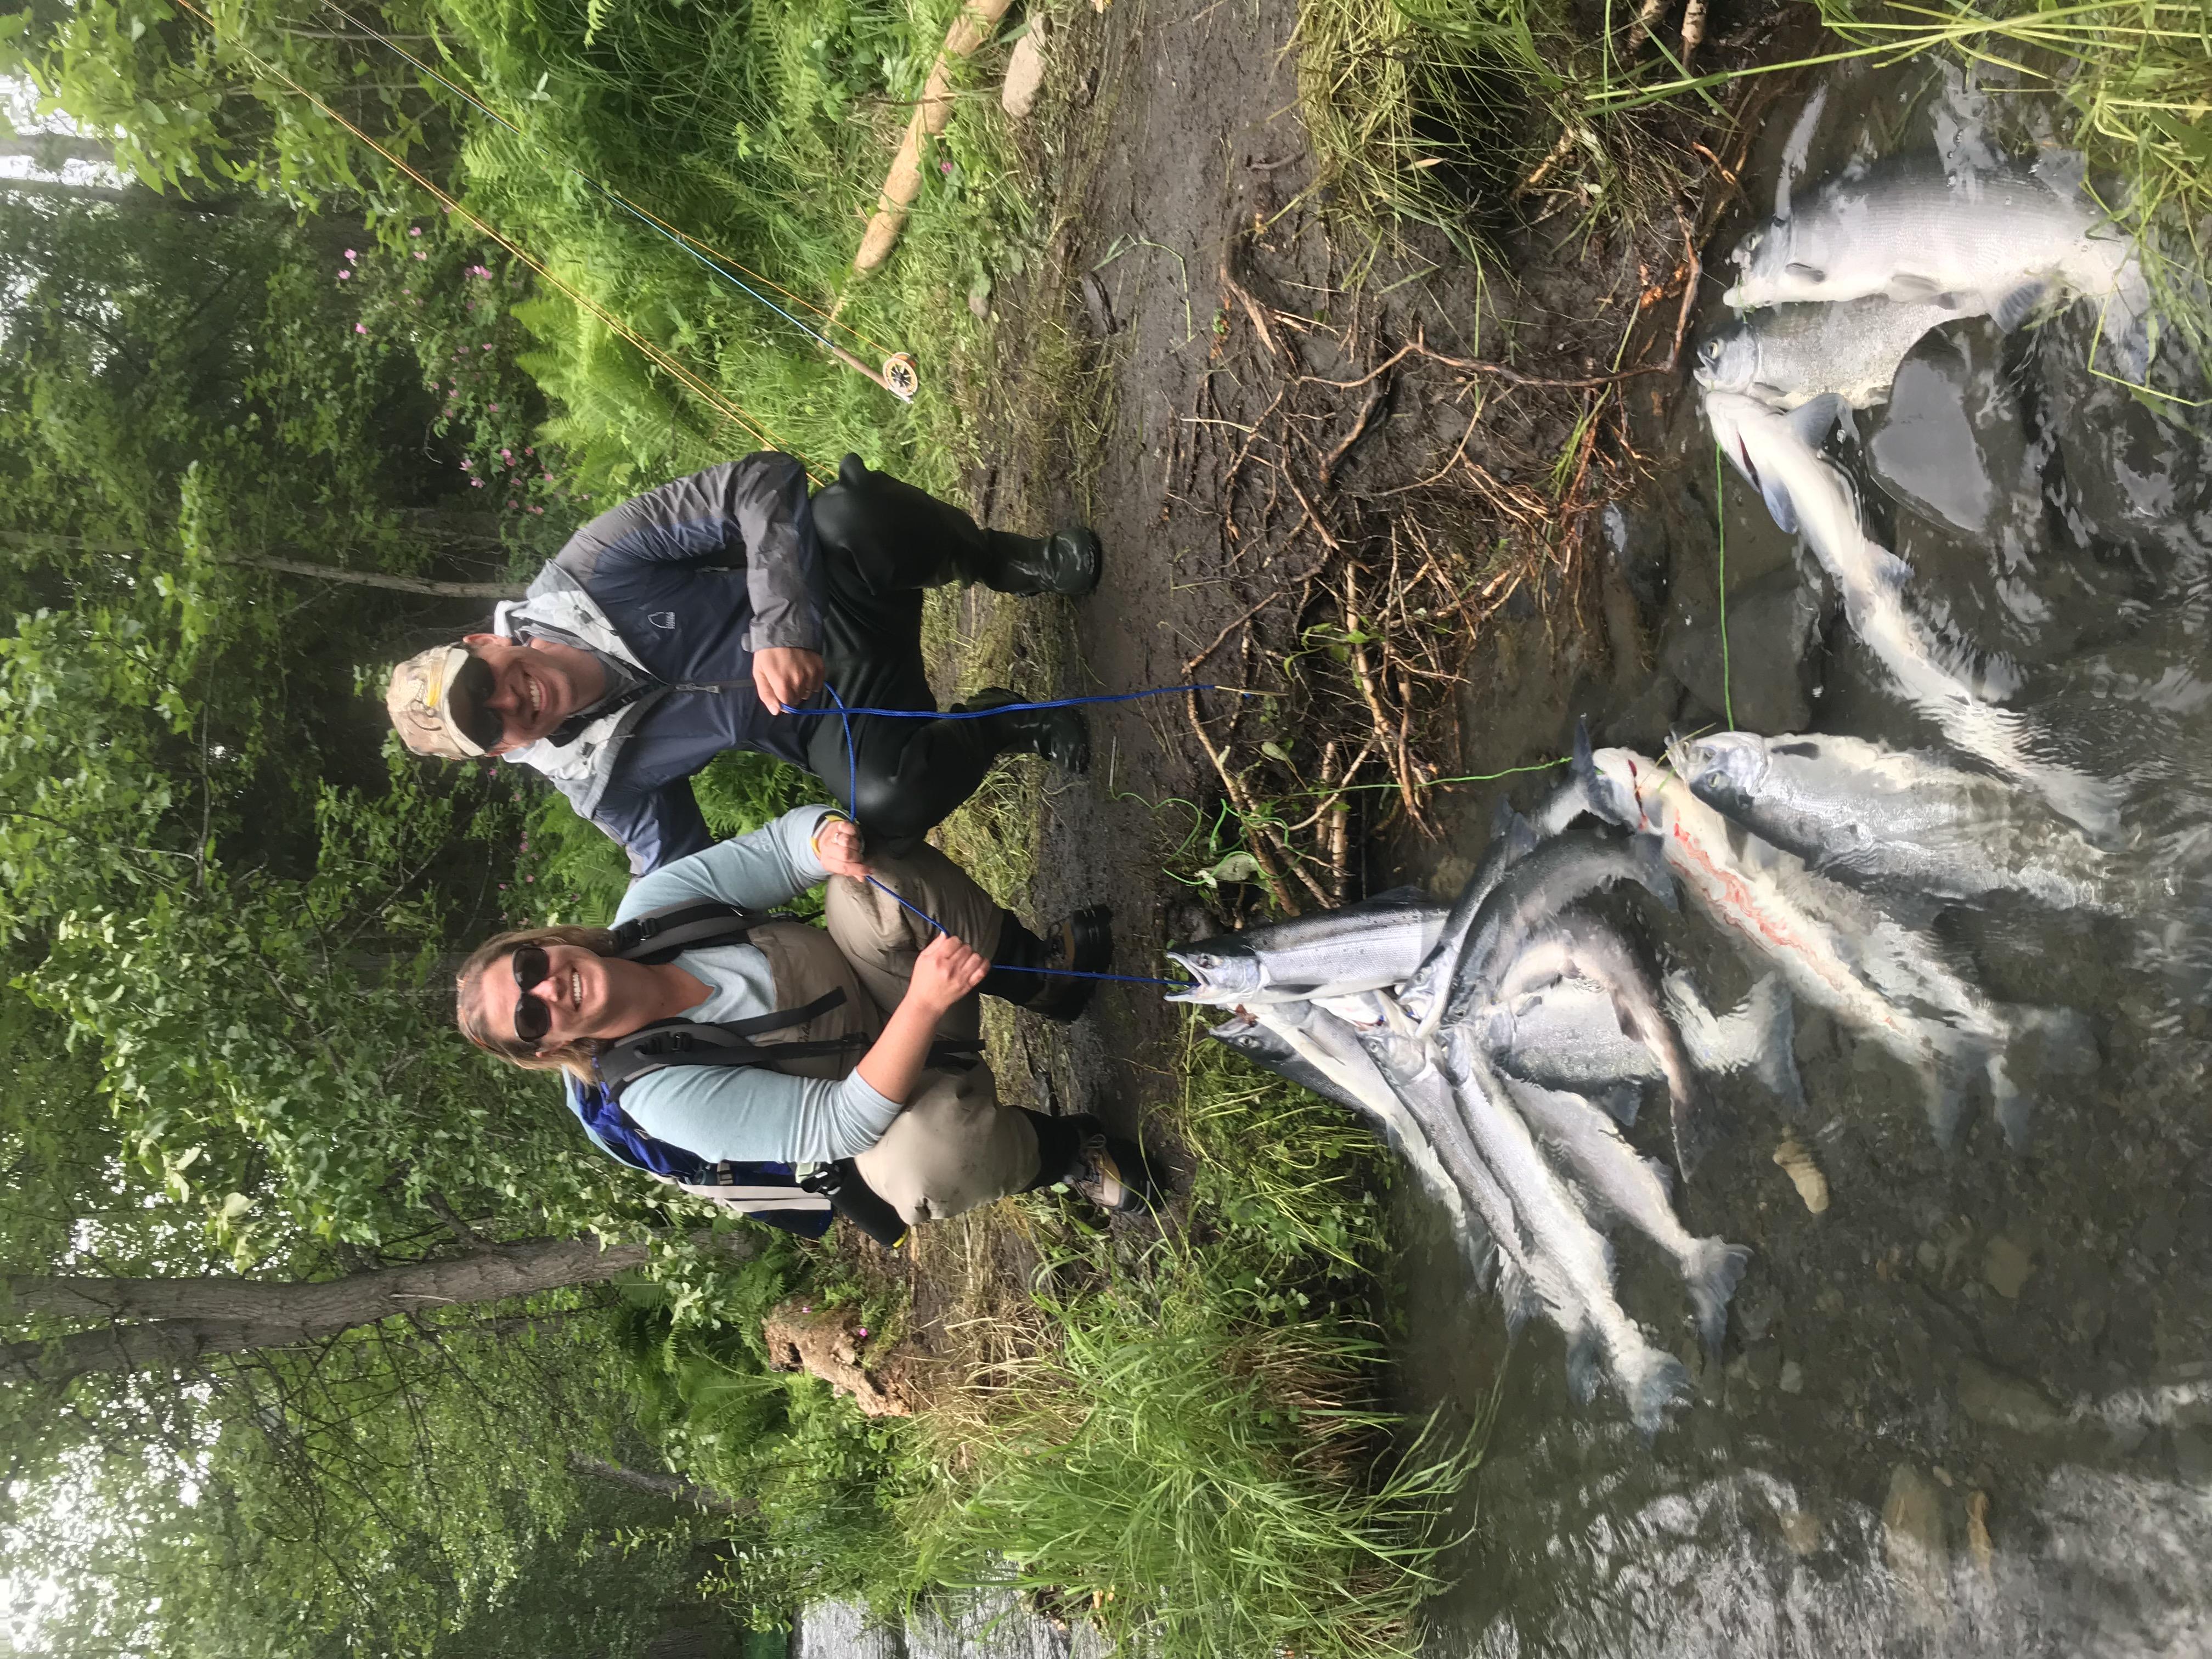 Russian River Cooper Landing Sockeye Salmon